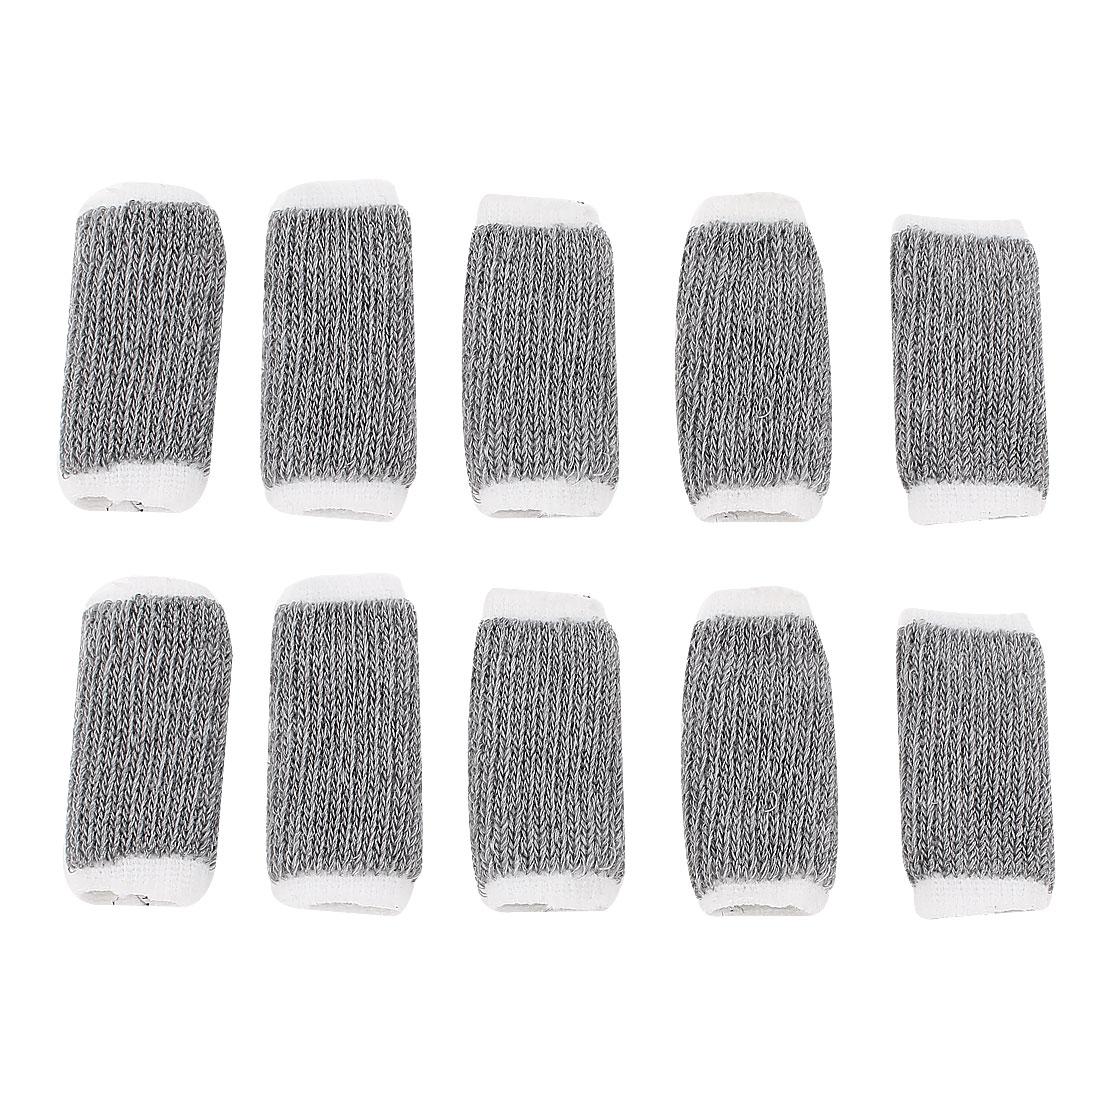 Sports Finger Sleeve Elastic Protector 10pcs Gray